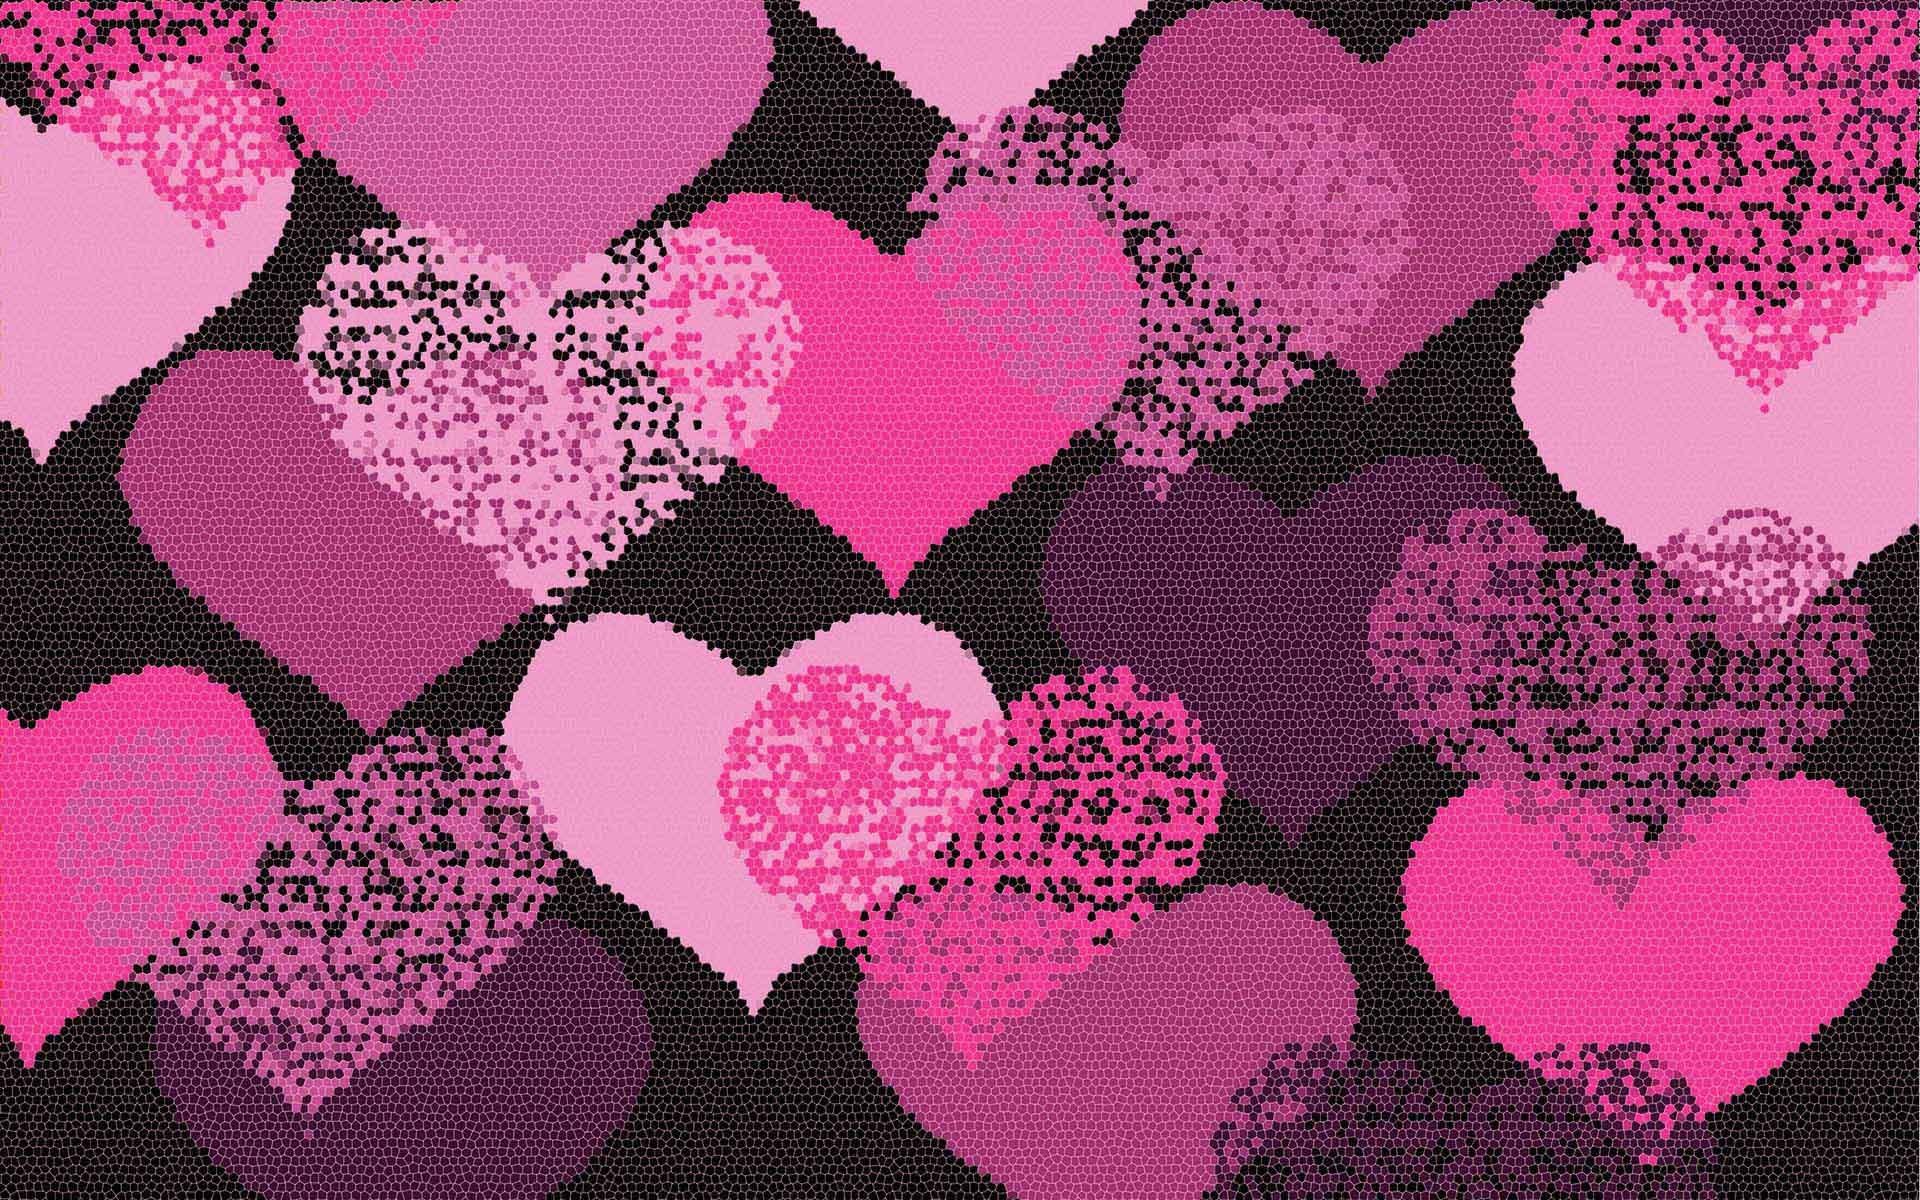 Pink Love Background 28540 Best HD Wallpapers   Wallpaiper.